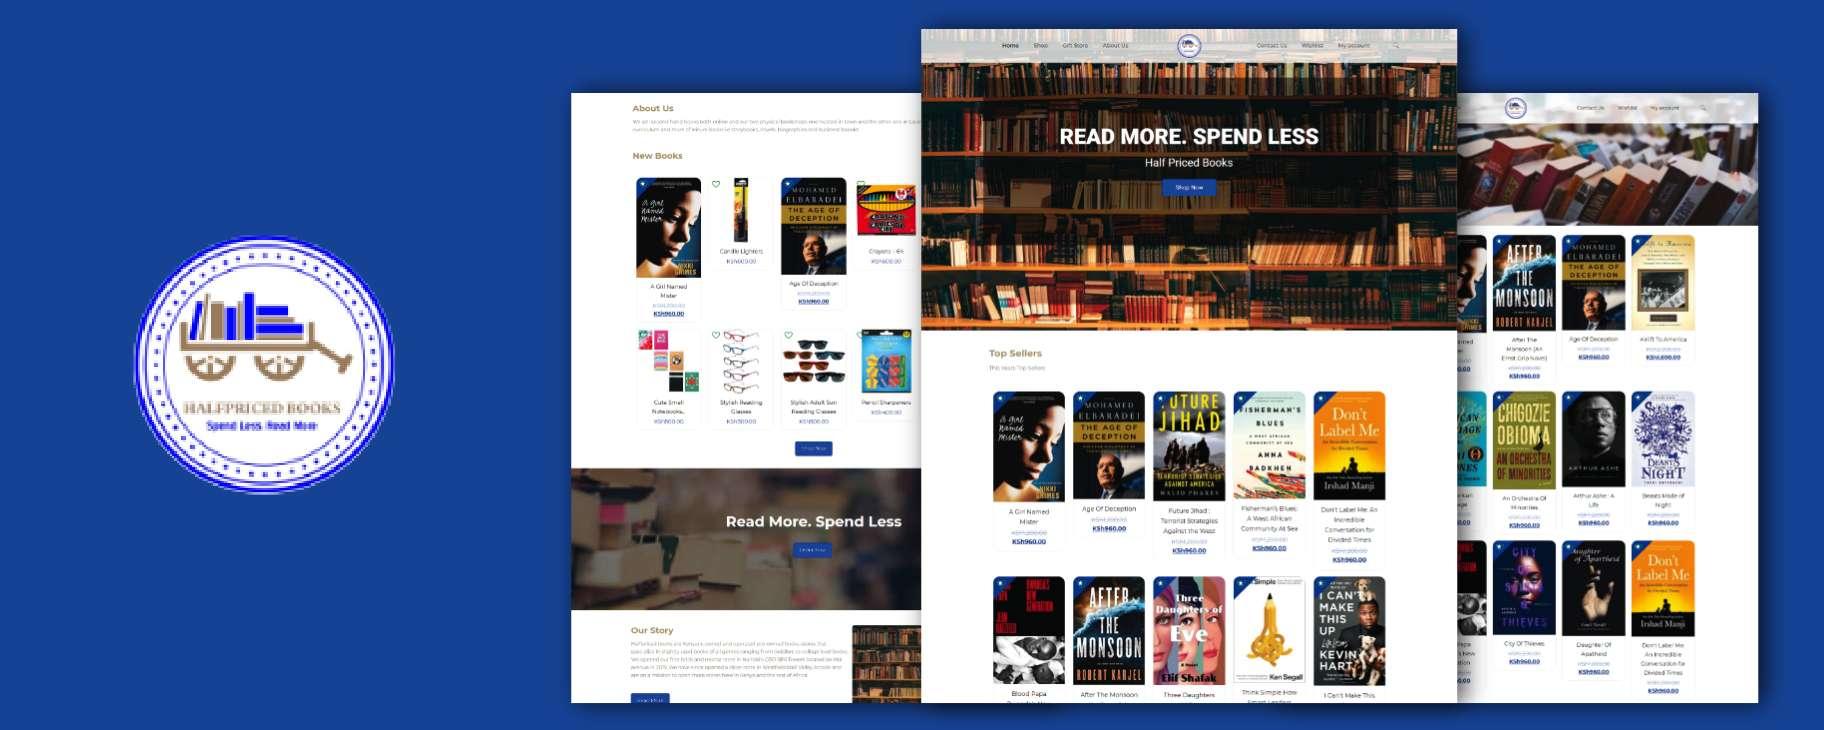 HalfPriced Books_15